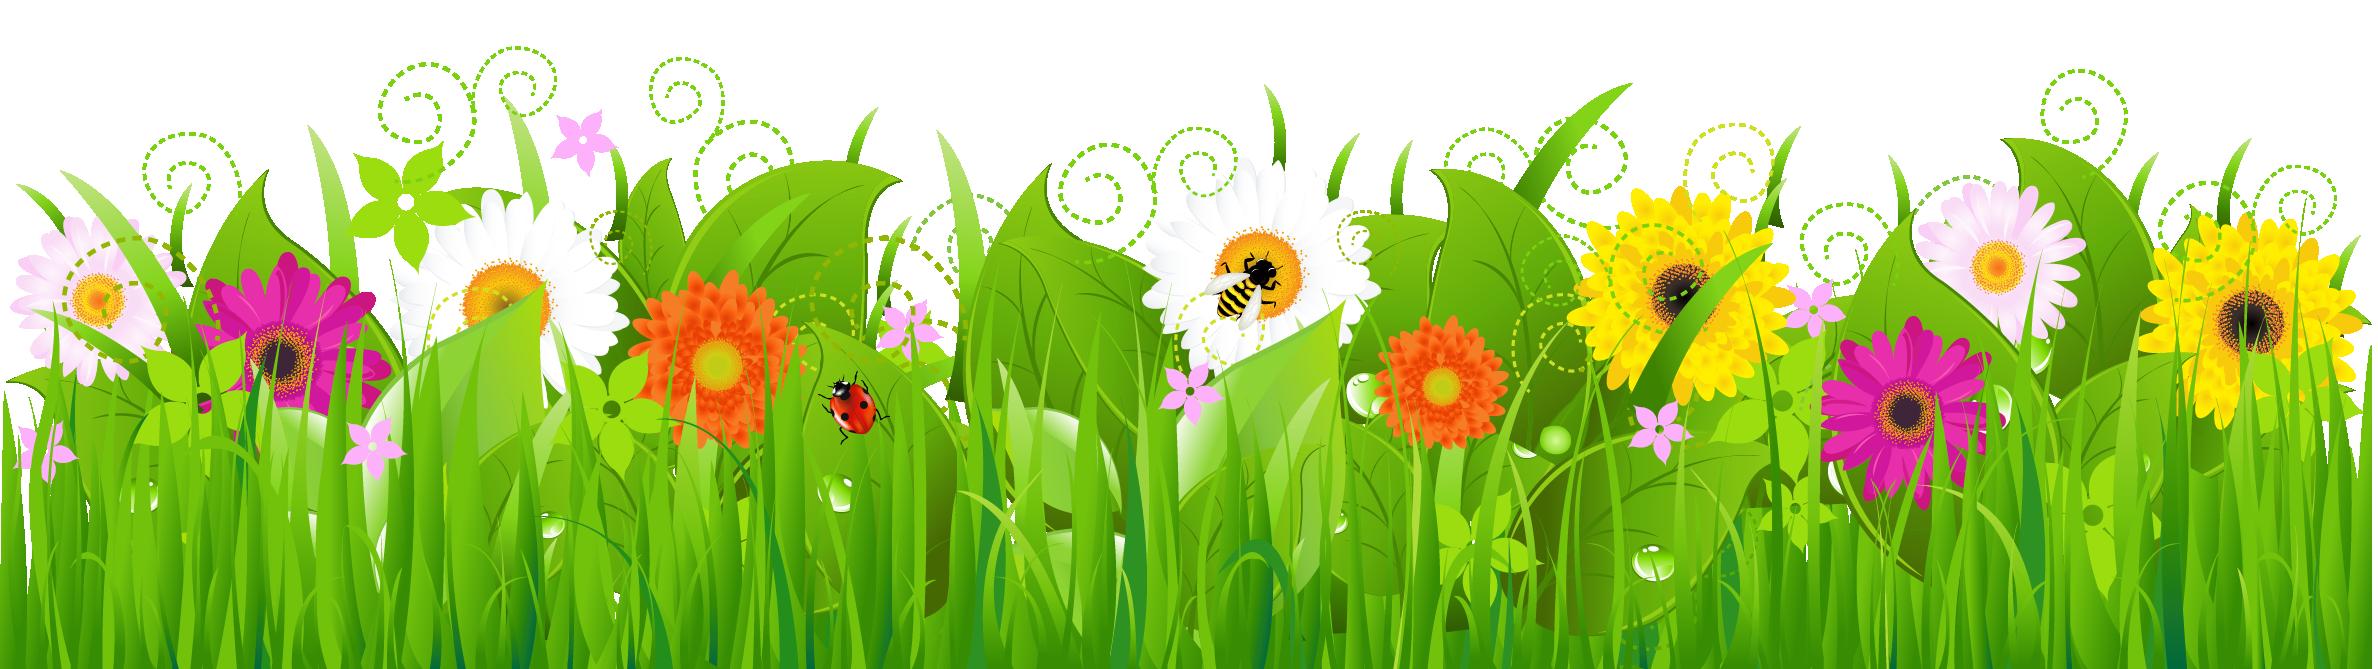 clip art grass clipart cliparts for you clipartix 2 [ 2378 x 669 Pixel ]